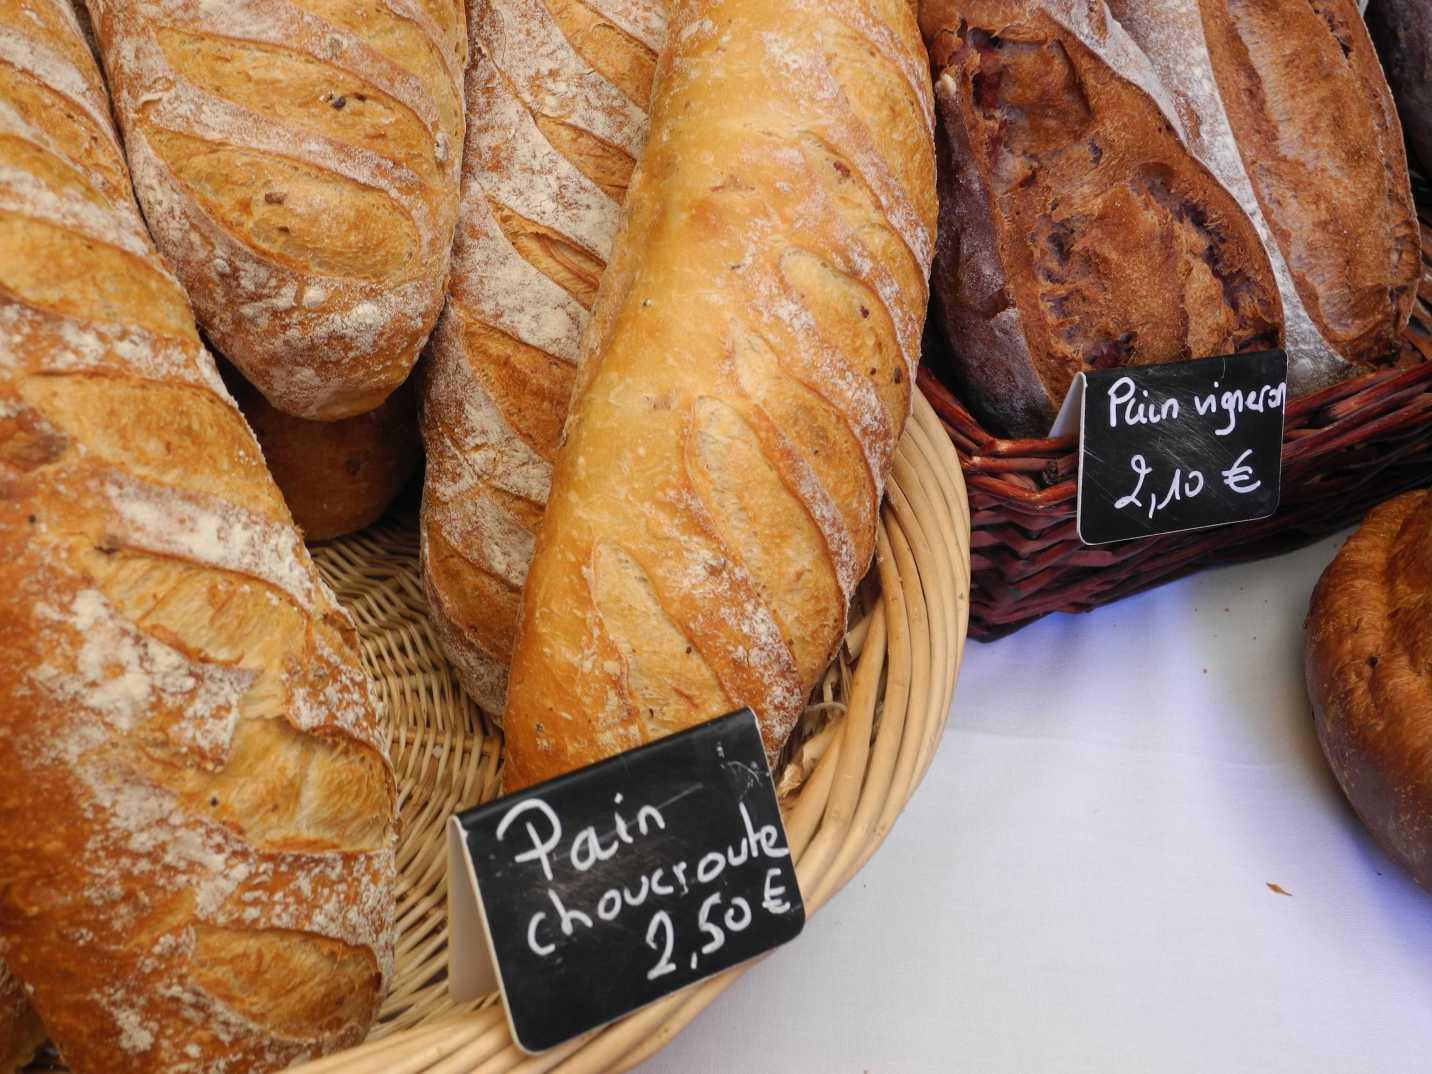 Typisch Elsass: Sauerkraut geht immer